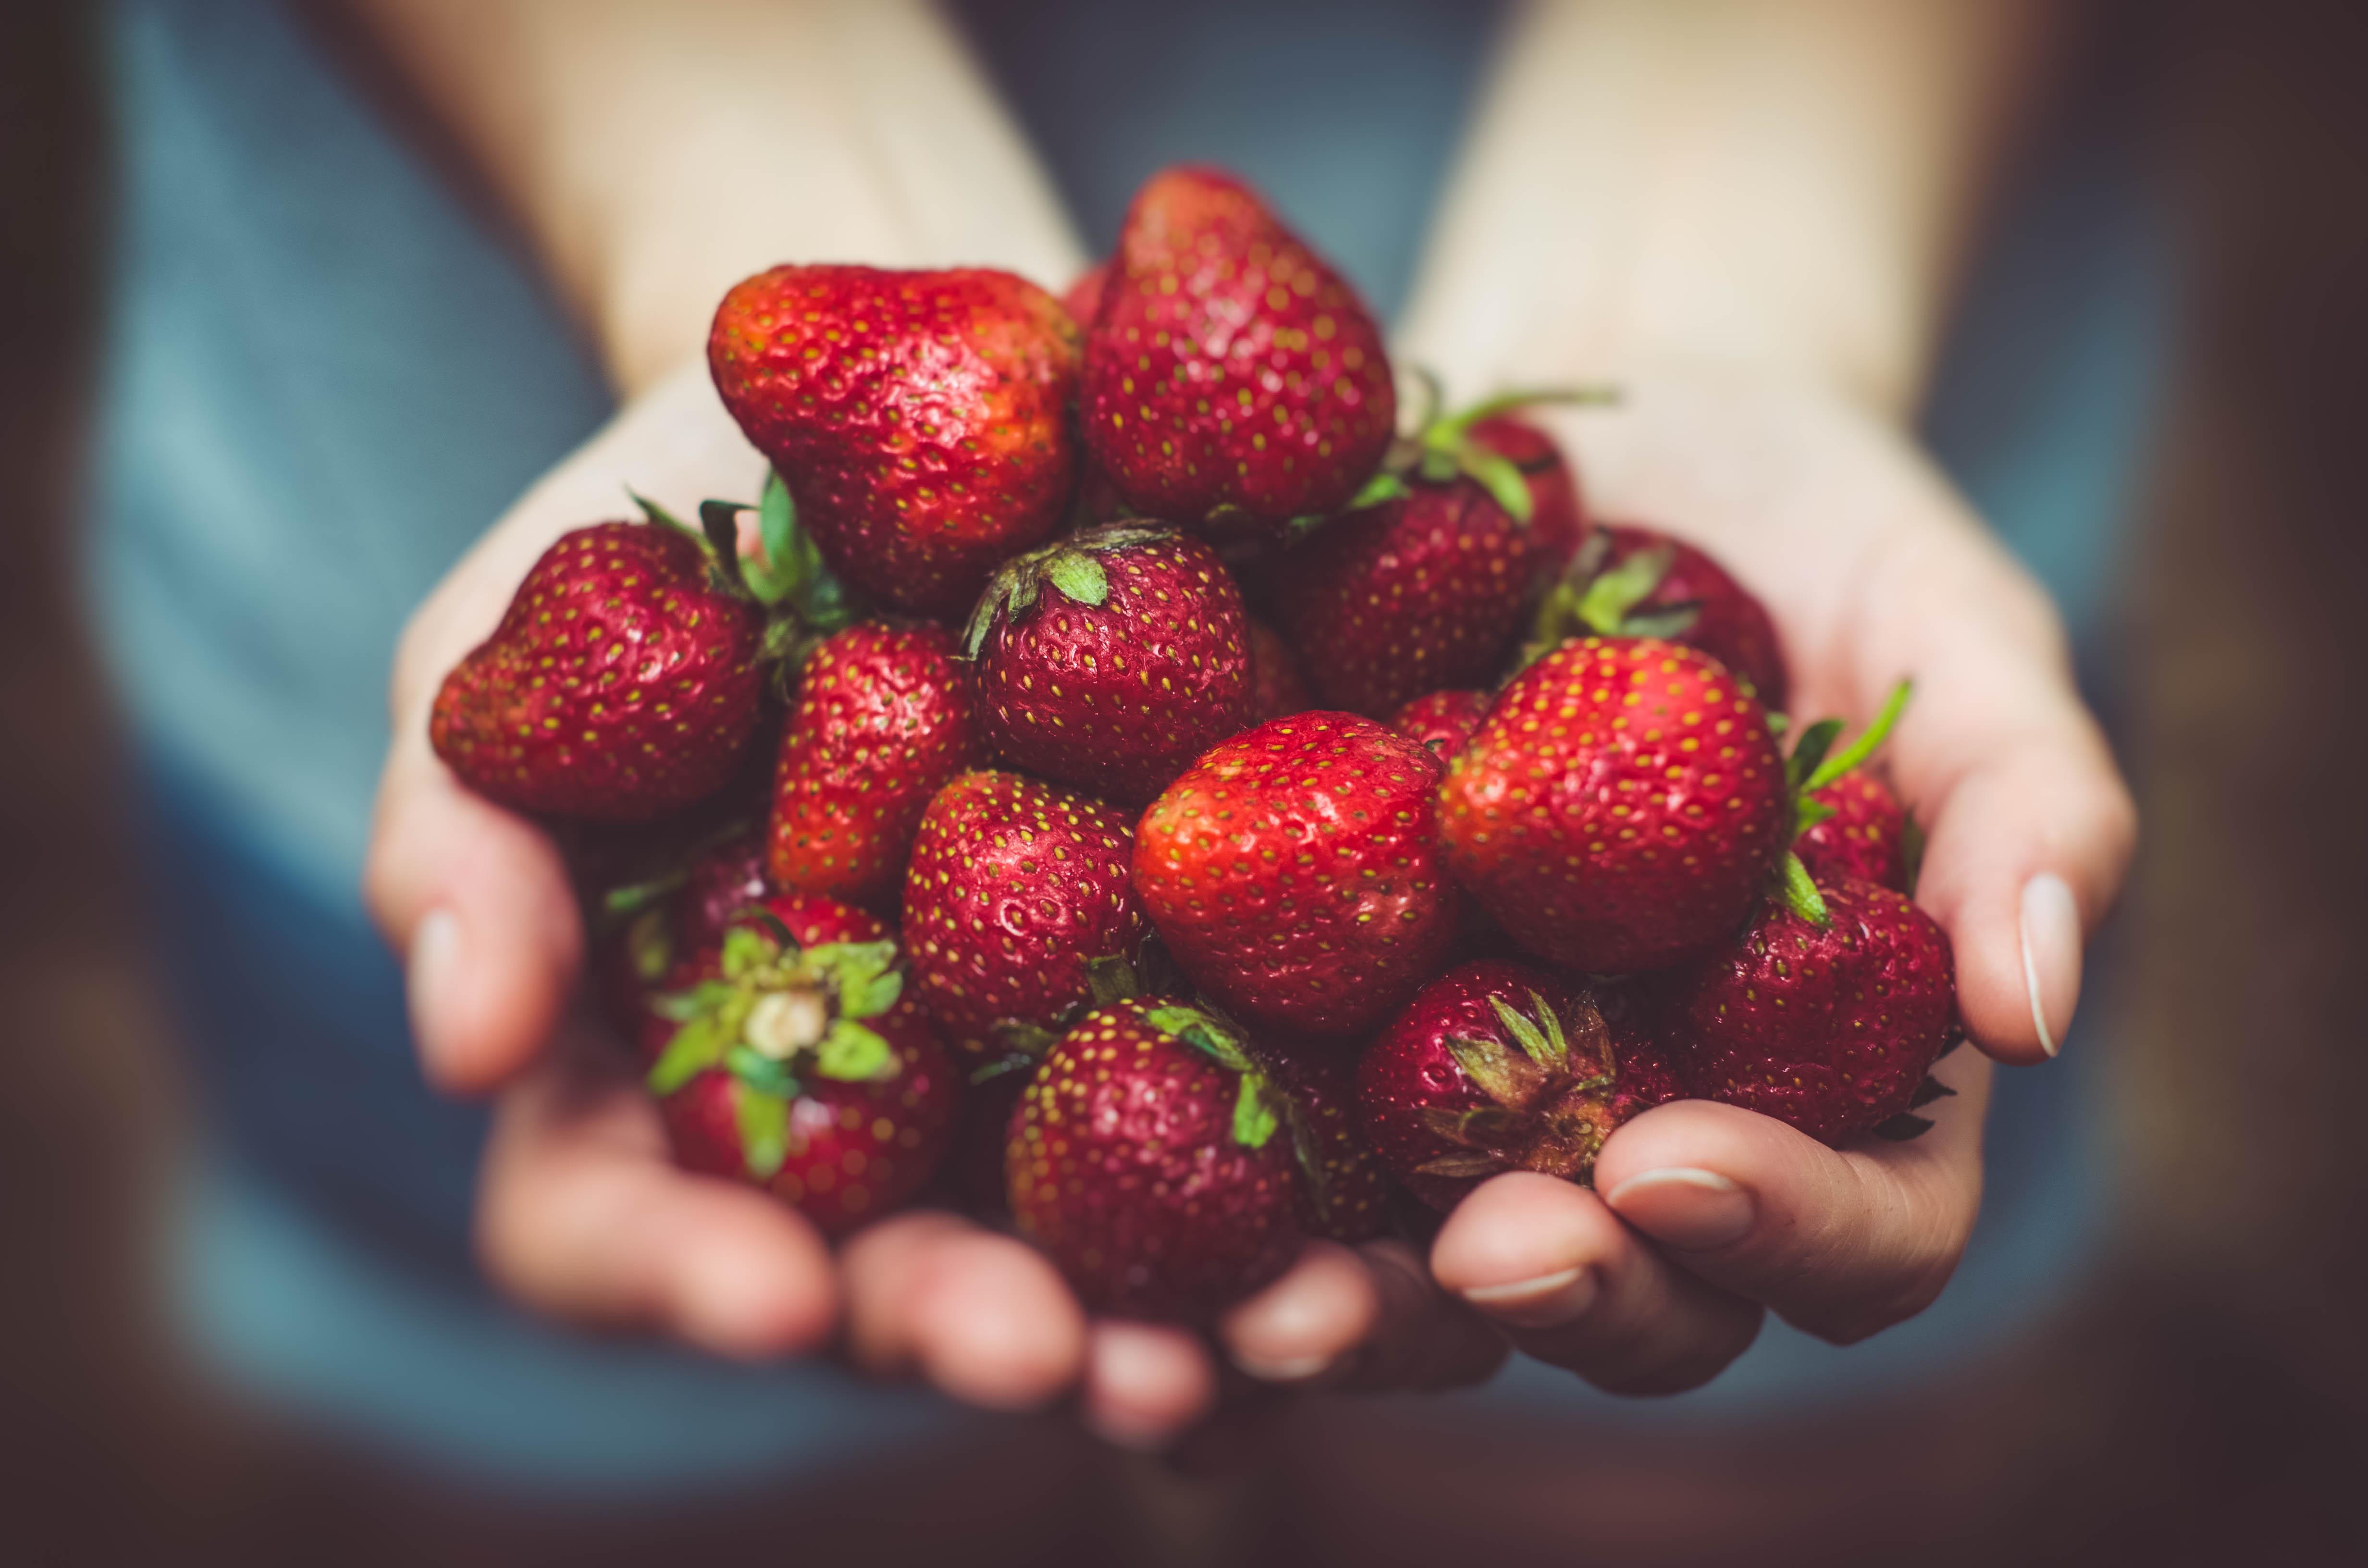 strawberries hands healthy eating